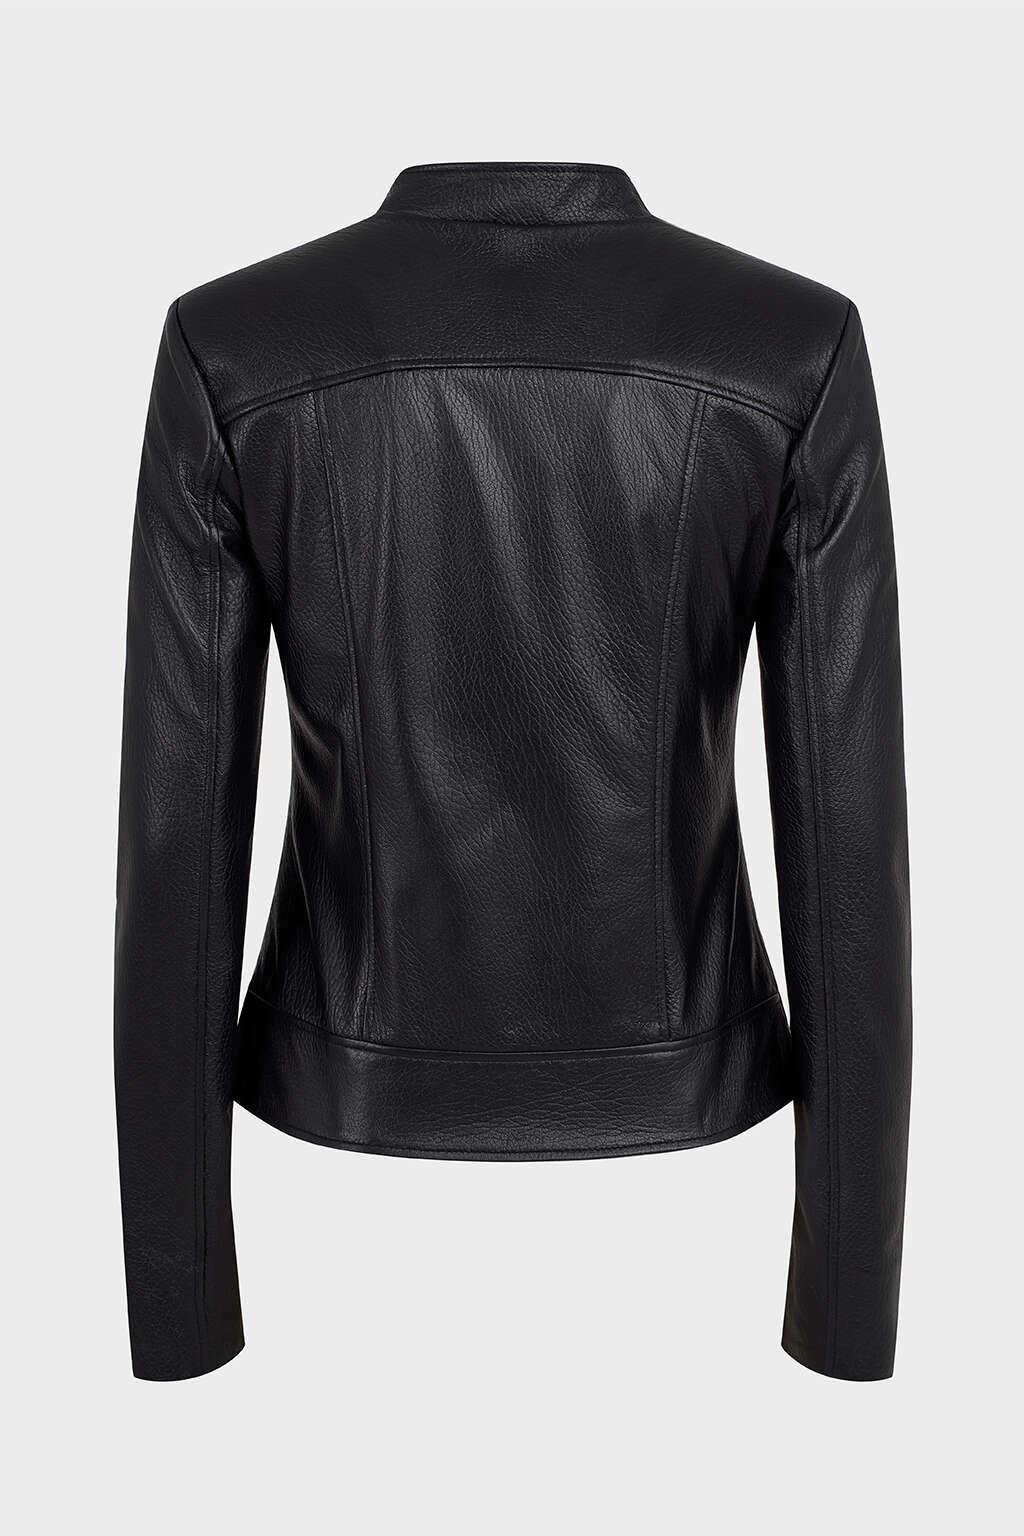 Back of Black Asymmetrical Biker Leather Jacket